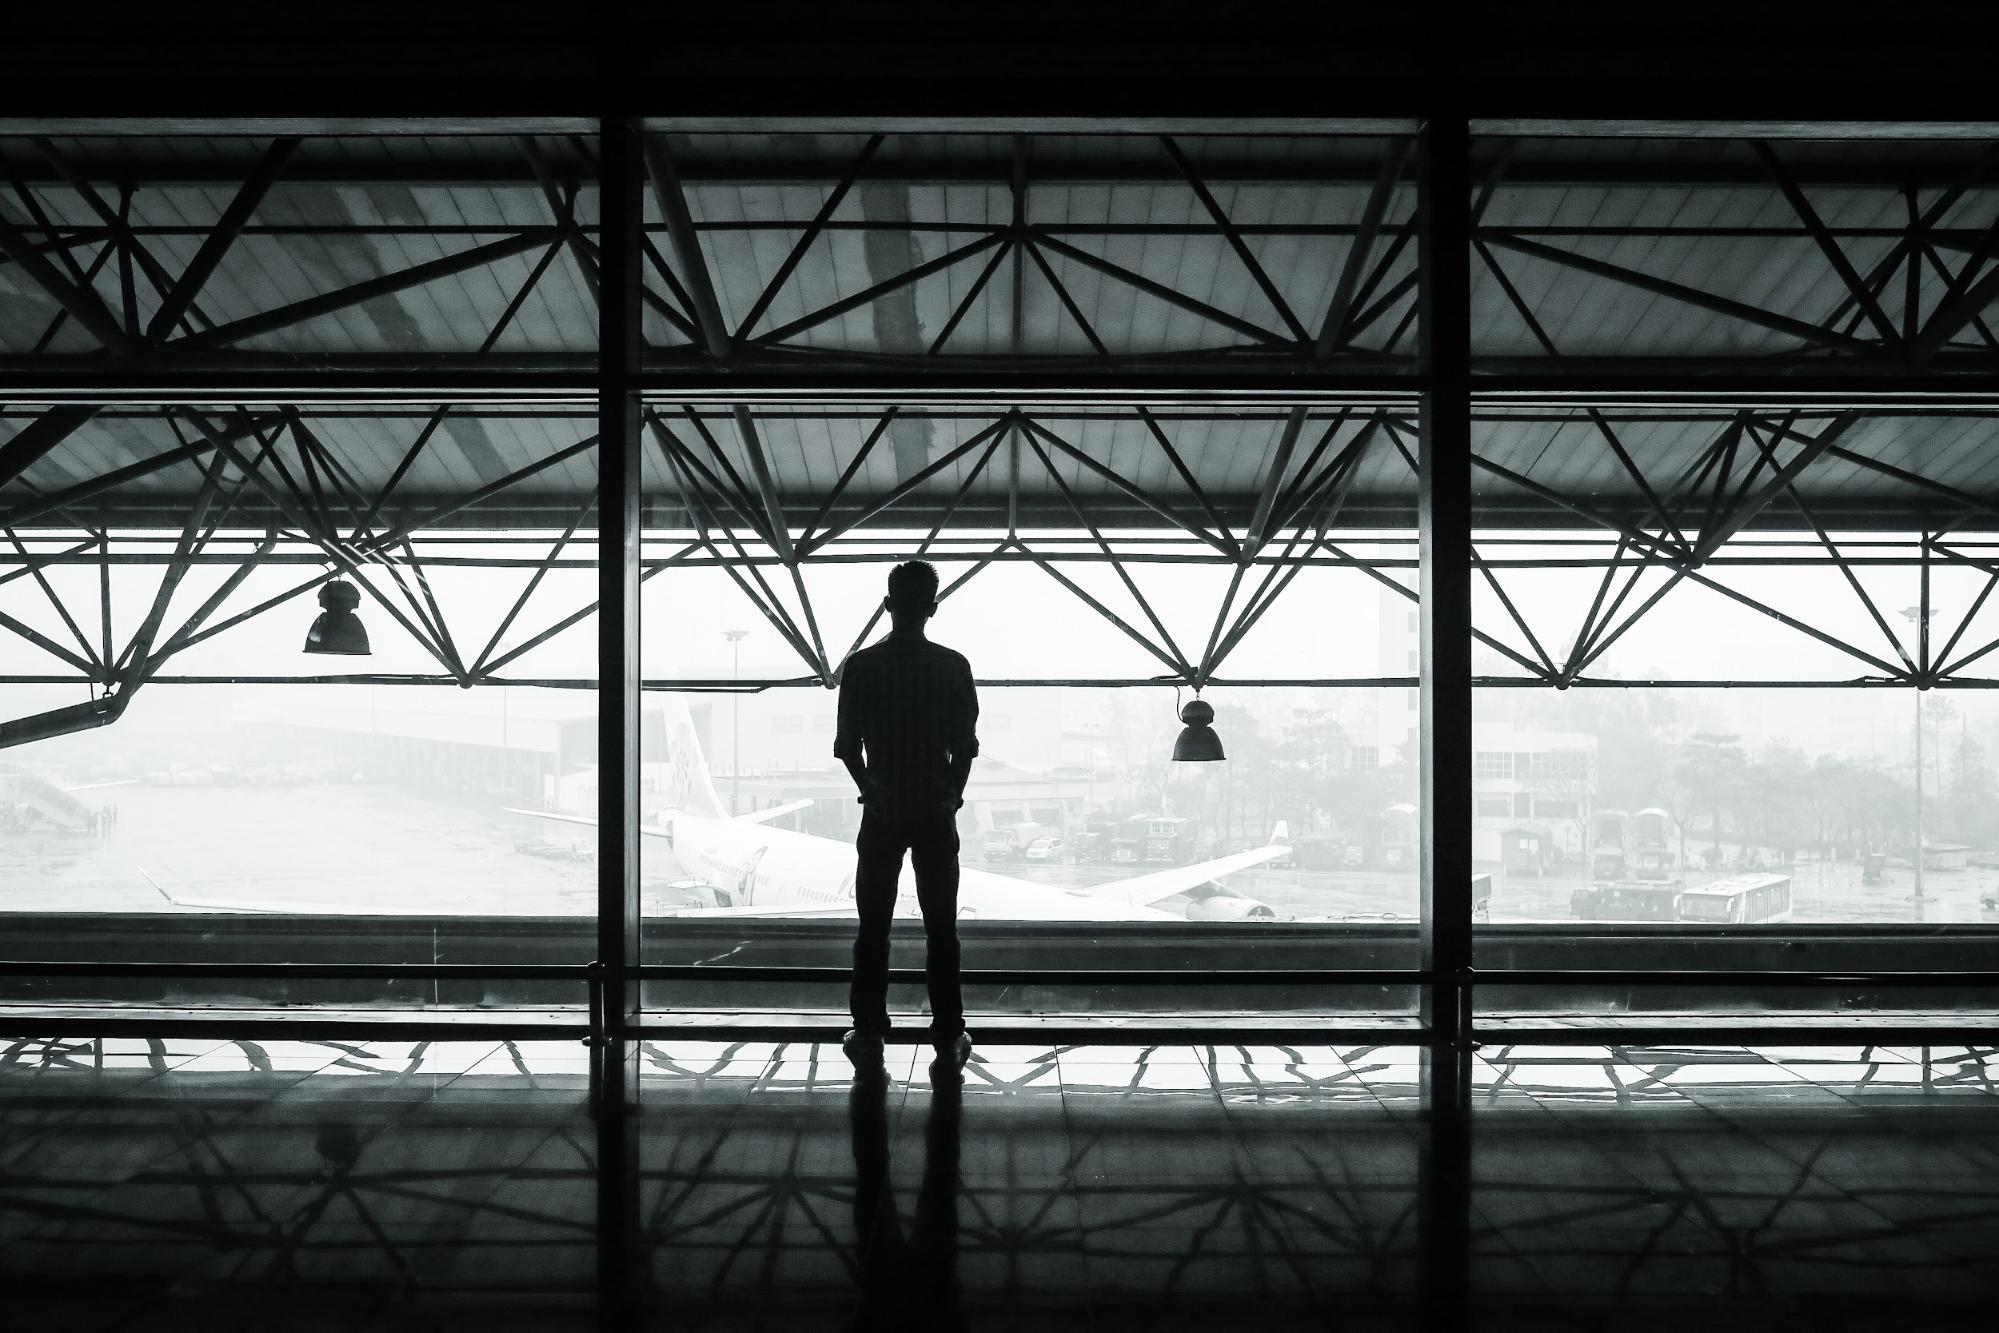 Man in terminal looking at airplane